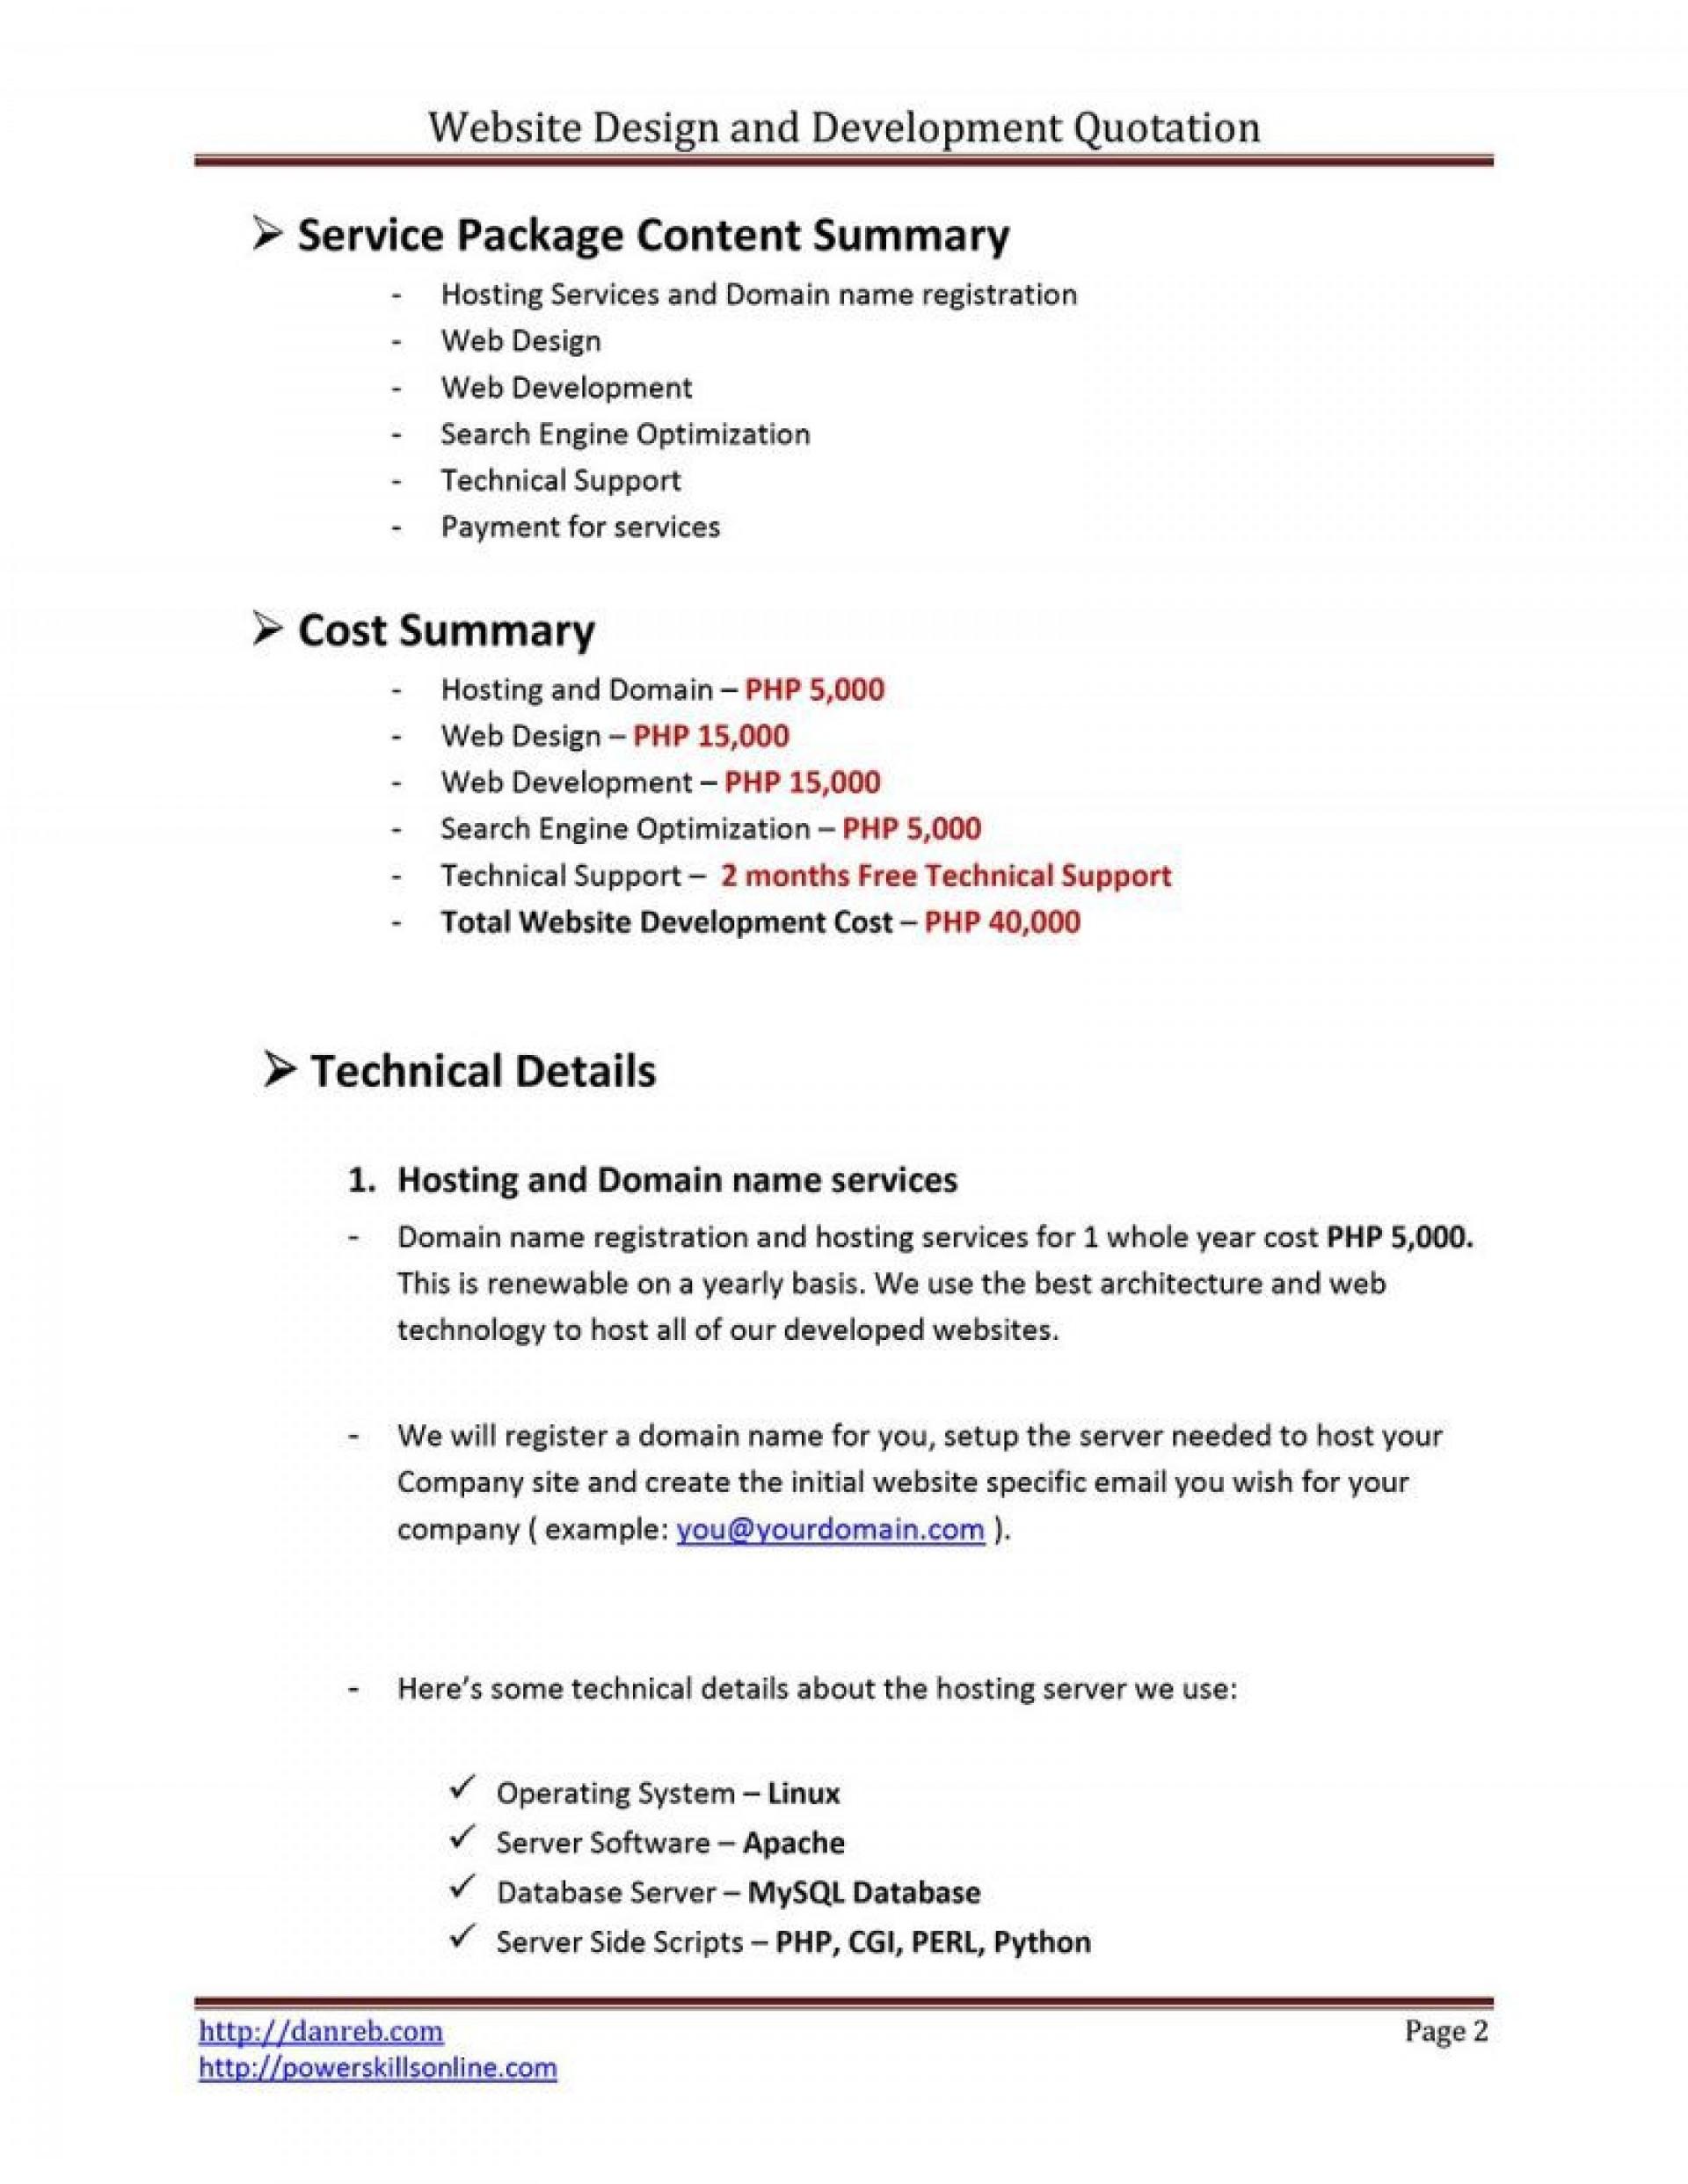 009 Fantastic Web Development Proposal Template Free High Def 1920